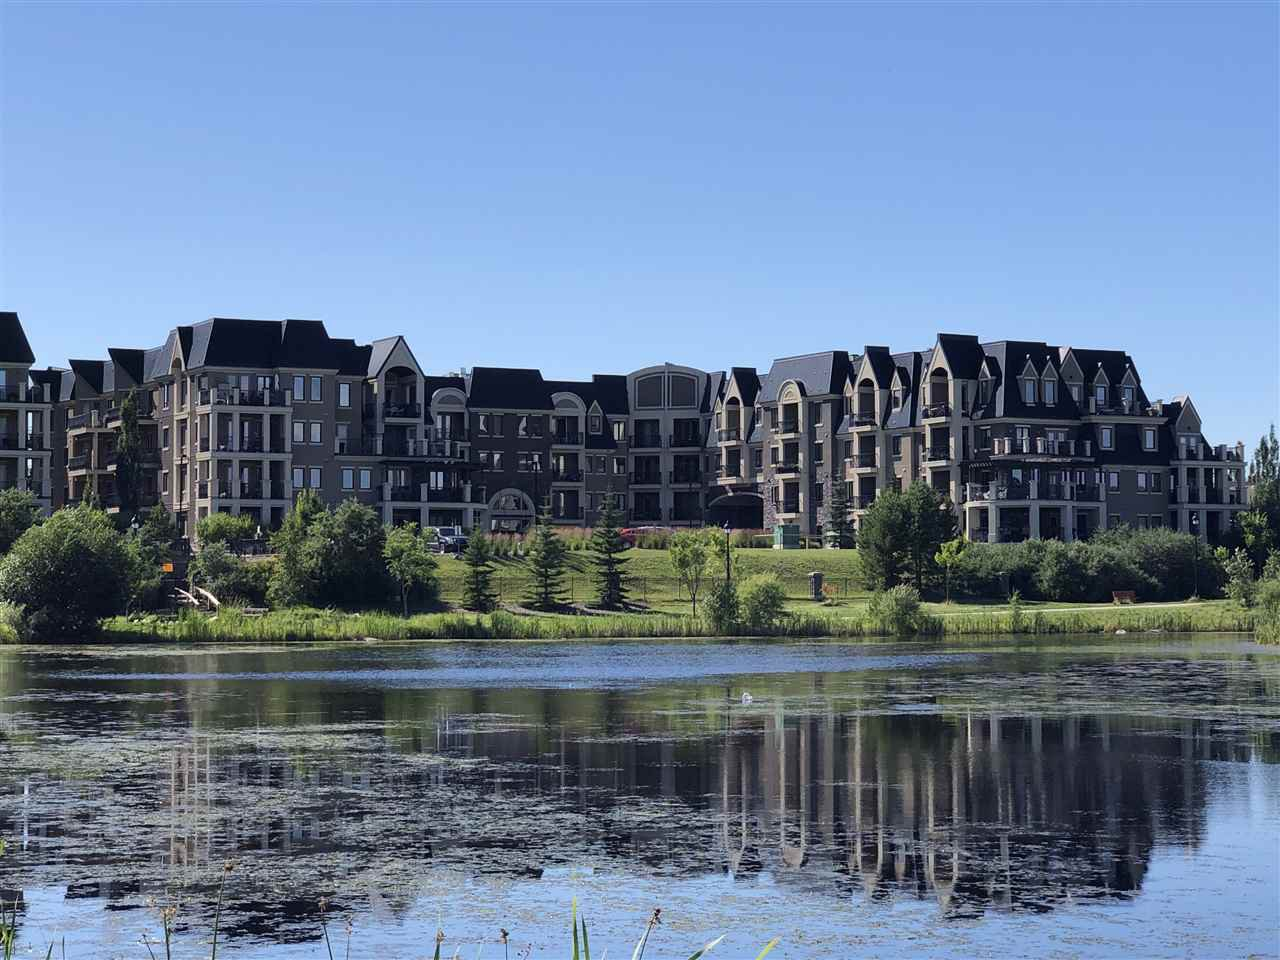 Main Photo: 227 6083 MAYNARD Way in Edmonton: Zone 14 Condo for sale : MLS®# E4207615